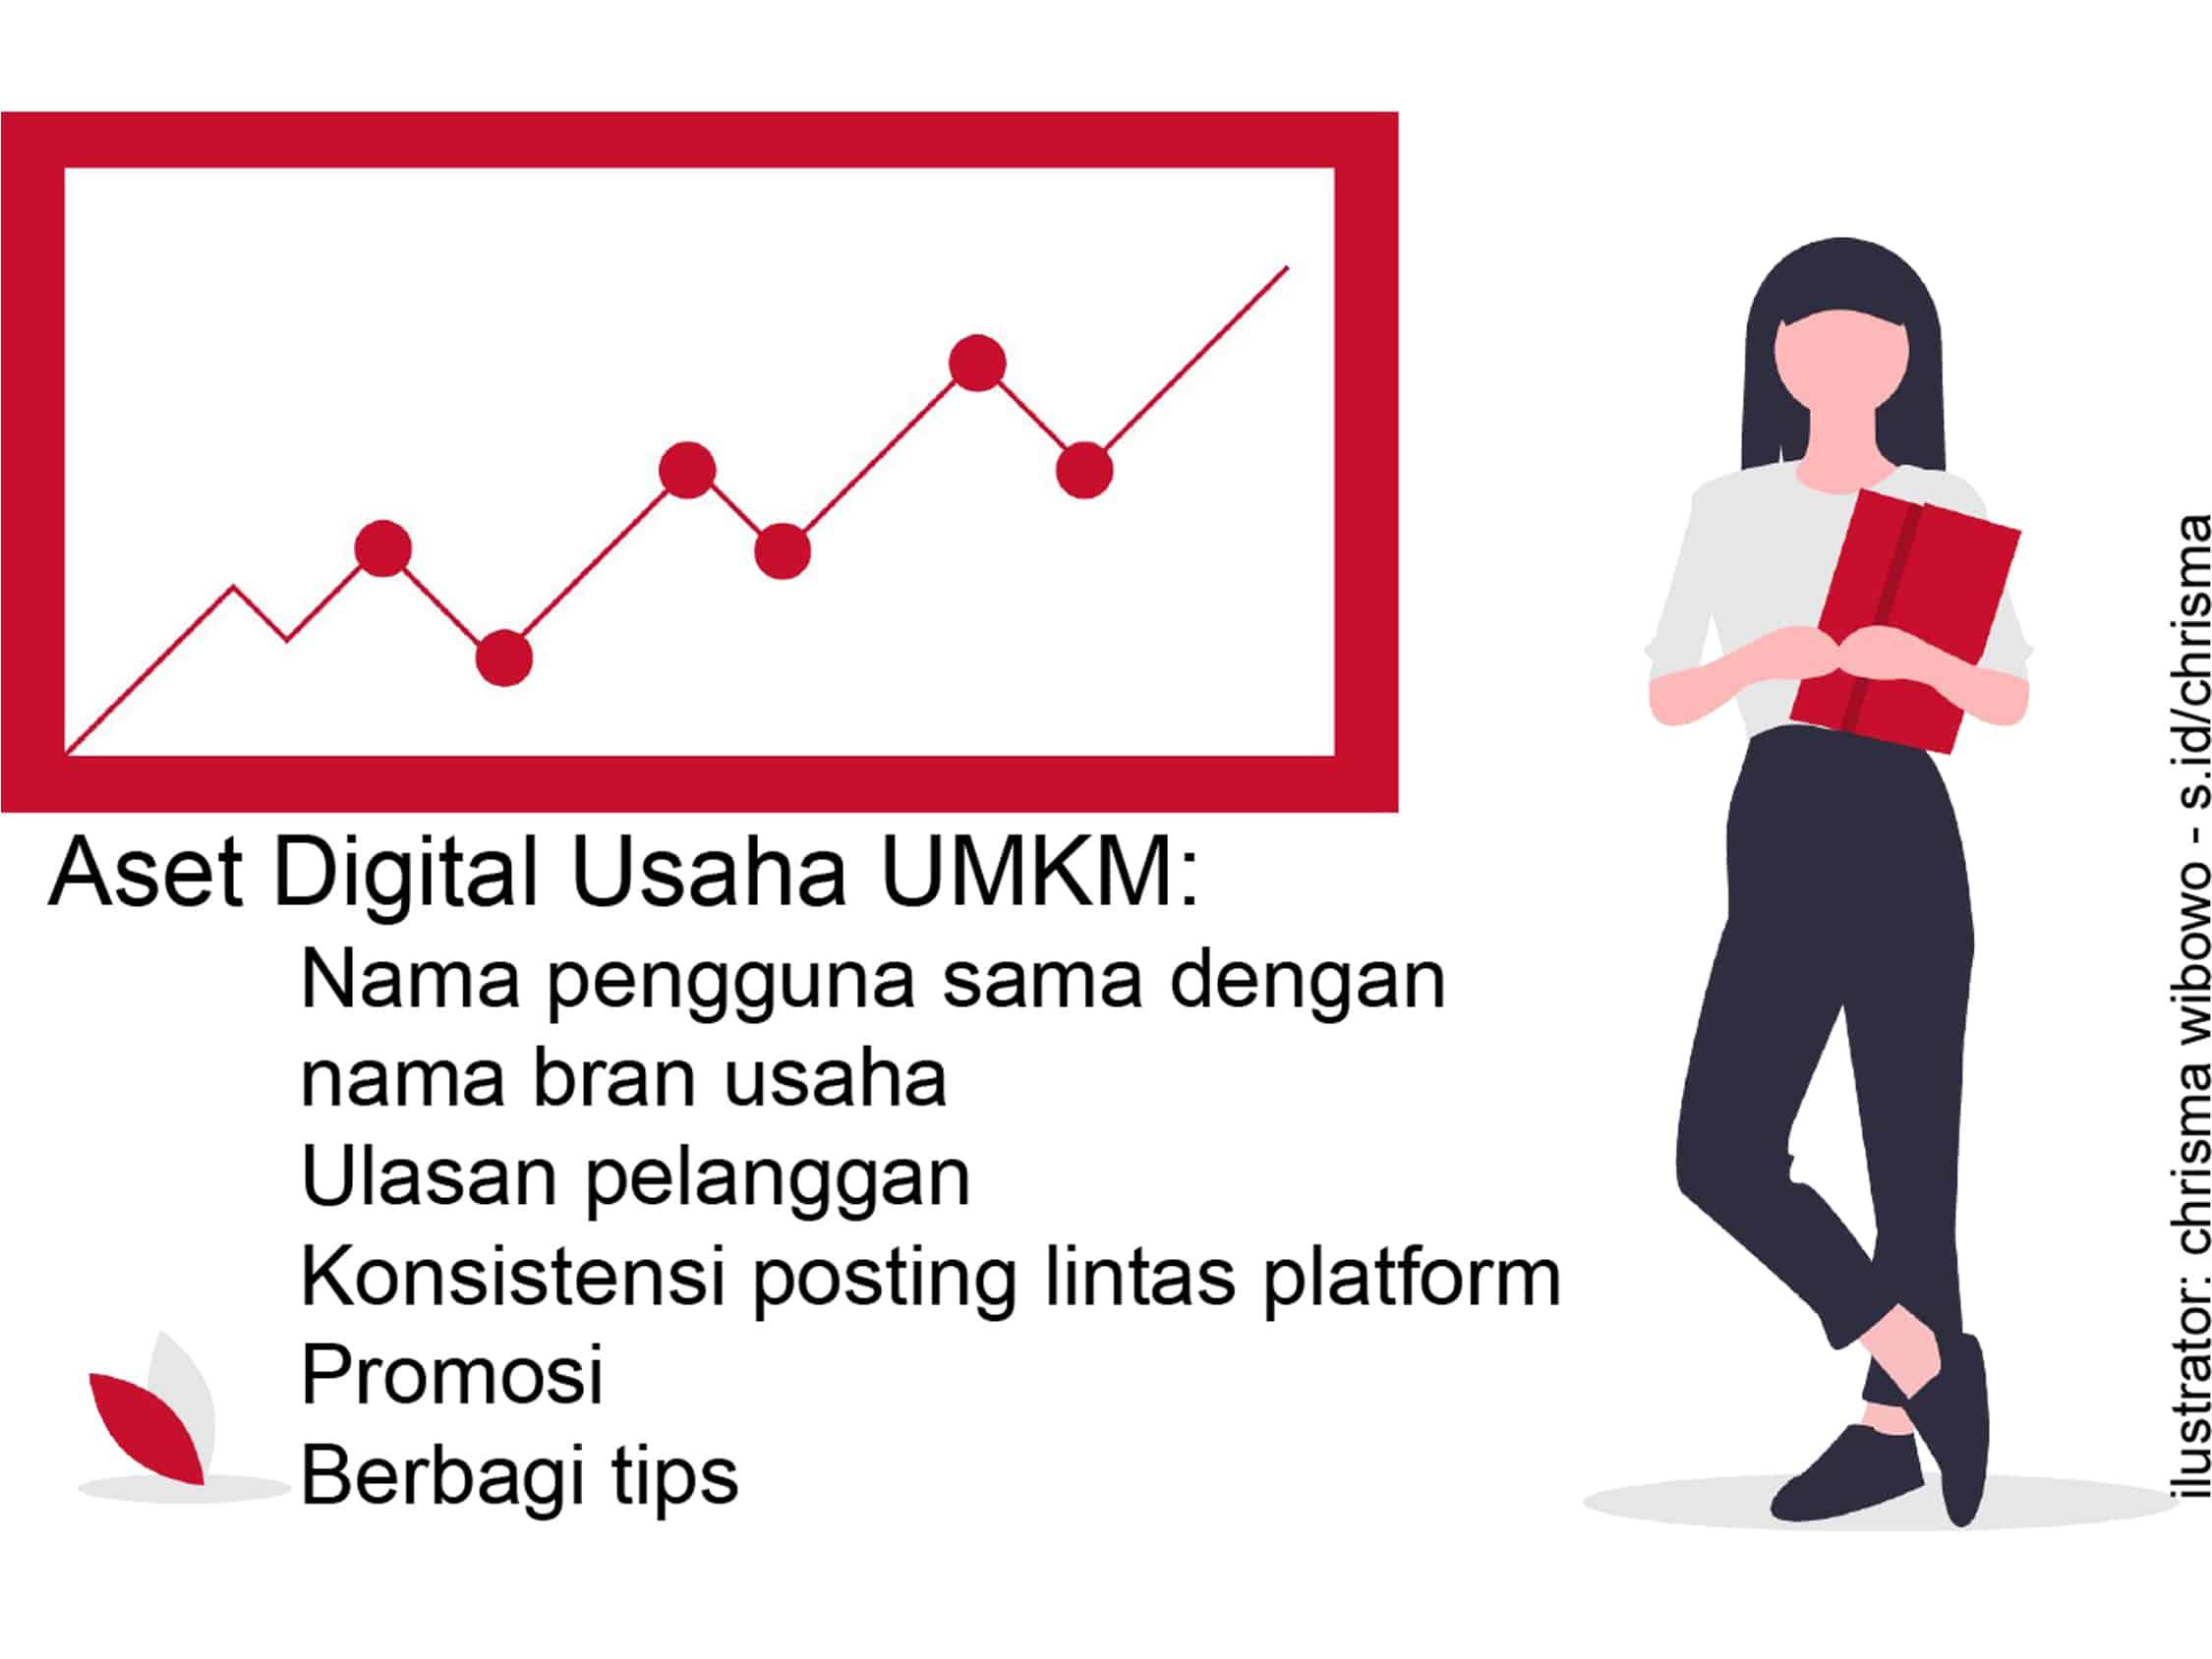 Aset Digital Usaha UMKM